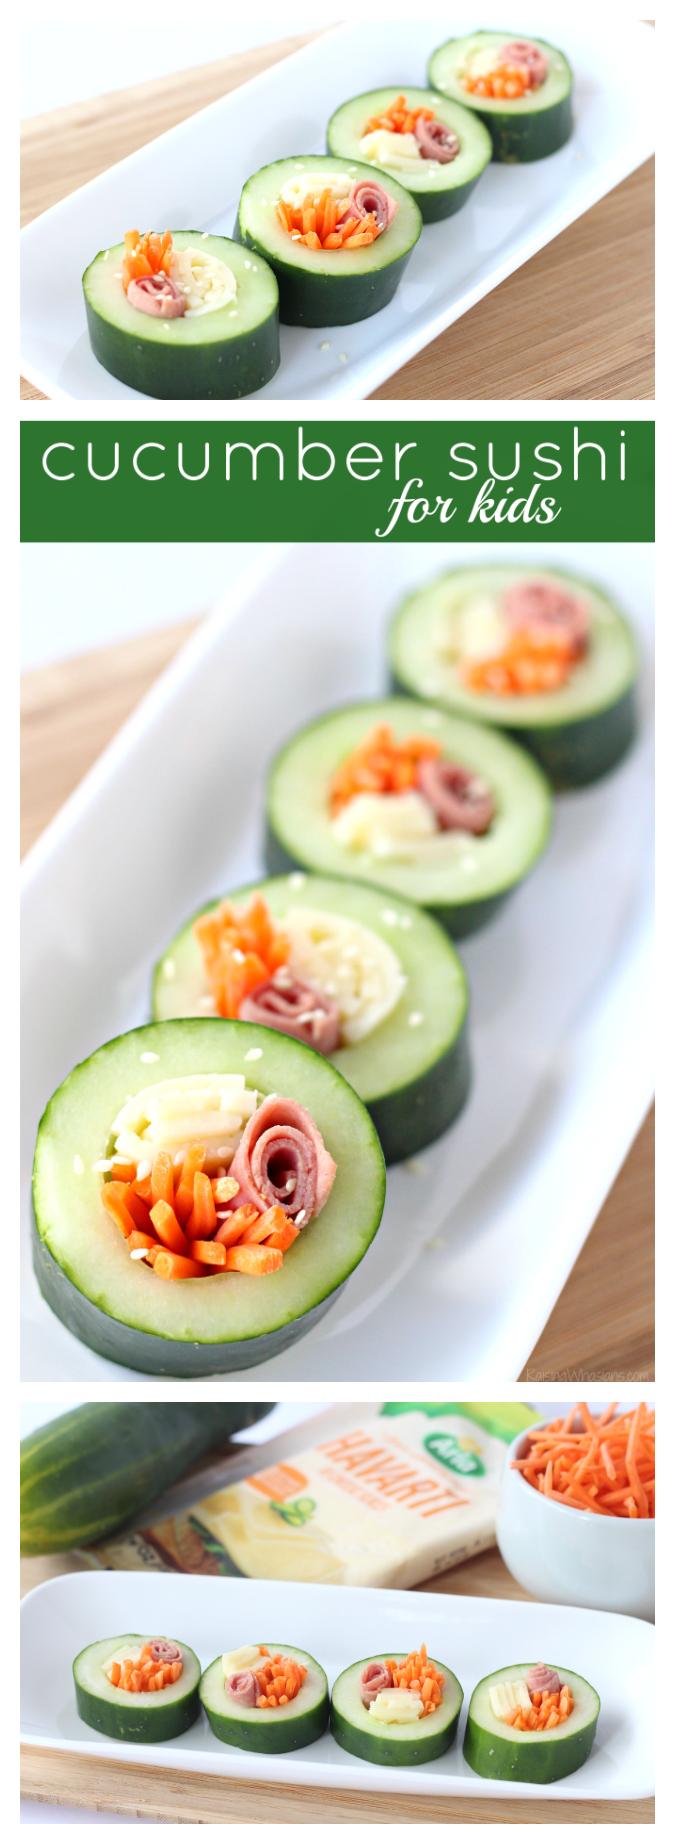 Cucumber sushi for kids pinterest